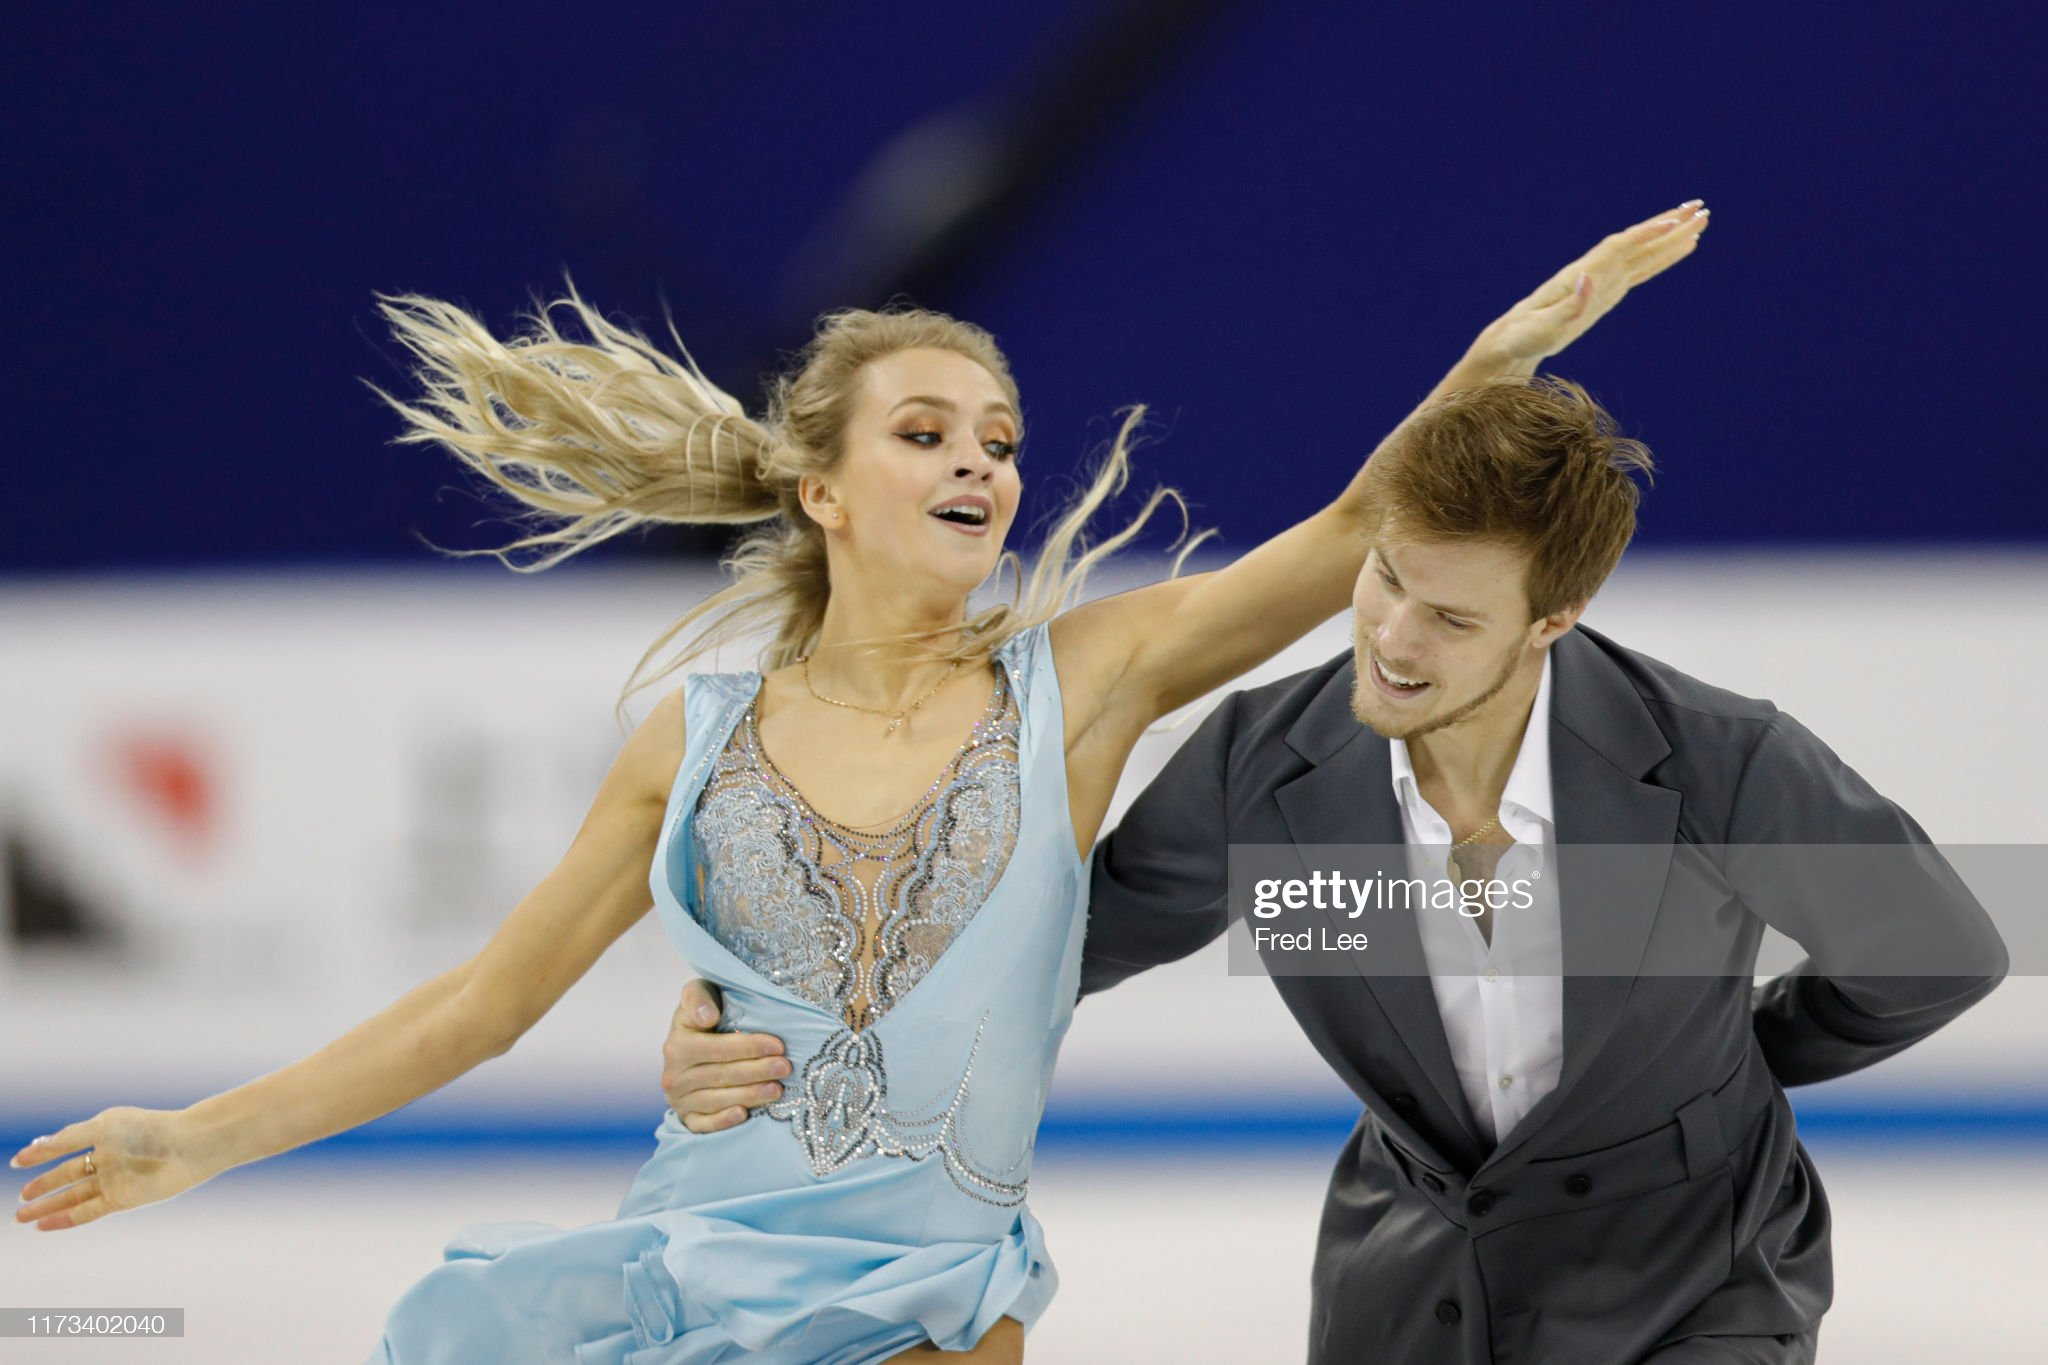 Shanghai Trophy (Invitational). 3-5 октября 2019. Шанхай (Китай) - Страница 3 Victoria-sinitsina-and-nikita-katsalapov-of-russia-compete-in-the-ice-picture-id1173402040?s=2048x2048